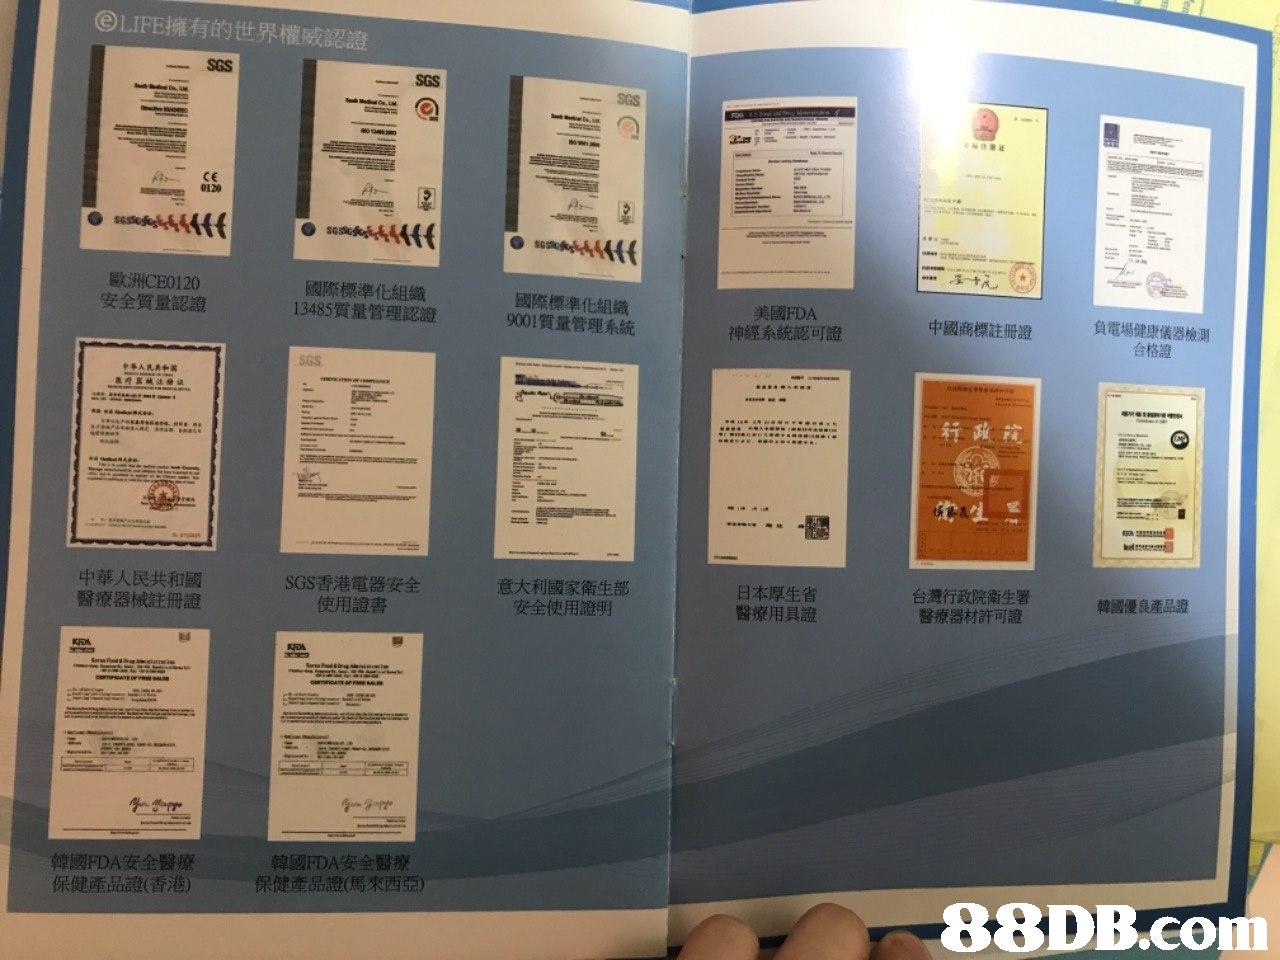 ⓔLIFE擁有的世界權威認證 歐洲CE0120 安全質量認證 國際標準化組織 13485質量管理認證 國際標準化組織 9001質量管理系統 美國FDA 神經系統認可證 負電場健康儀器檢測 合格證 中國商標註冊證 SGS 士生 中華人民共和國 醫療器械註冊證 SGS香港電器安 使用證書 意大利國家衛生部 安全使用證明 日本厚生省 醫療用具證 台灣行政院衛生署 醫療器材許可證 韓國優良產品證 韓國FDA安全醫療 保健產品證(香港) 韓國FDA安全醫療 保健產品證(馬來西亞   Text,Font,Display board